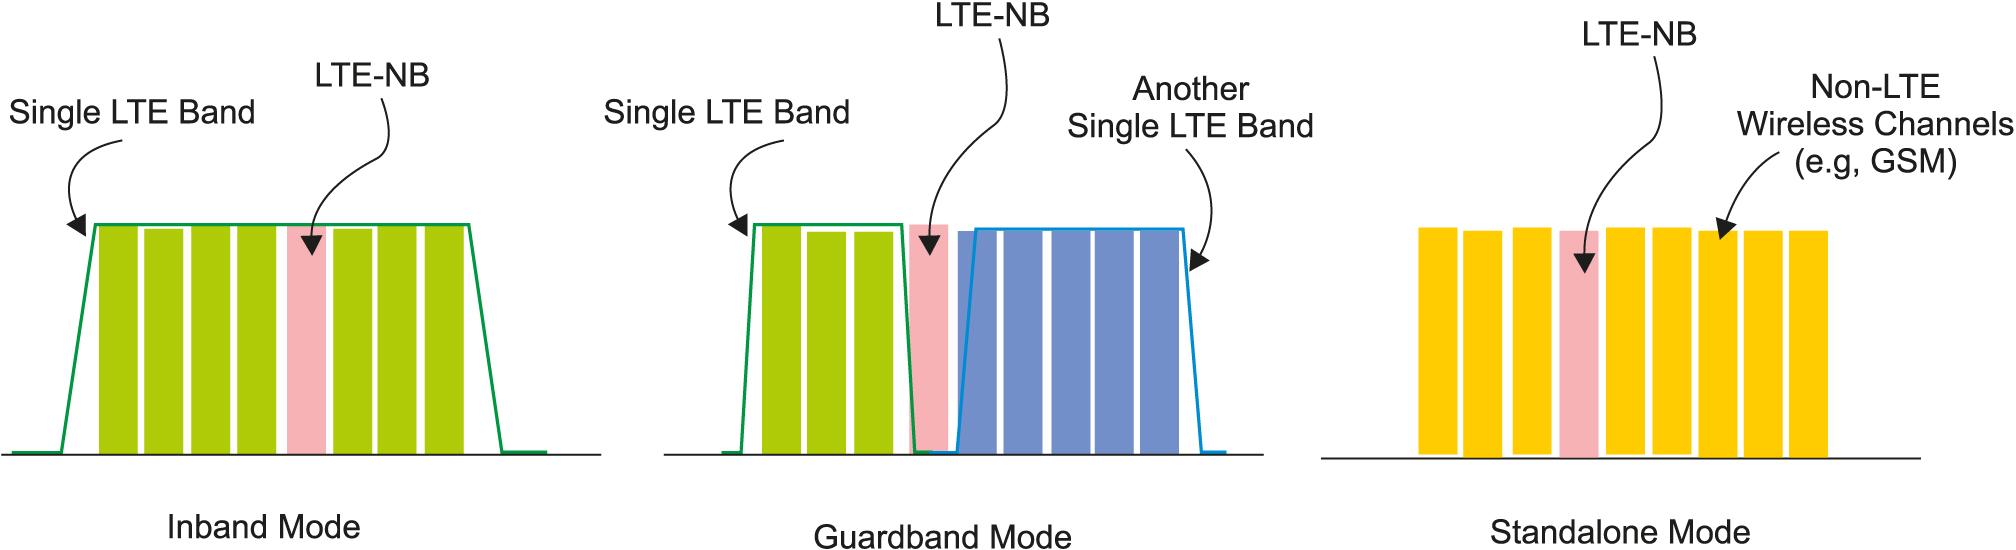 Три варианта рабочих диапазонов технологии NB-IOT